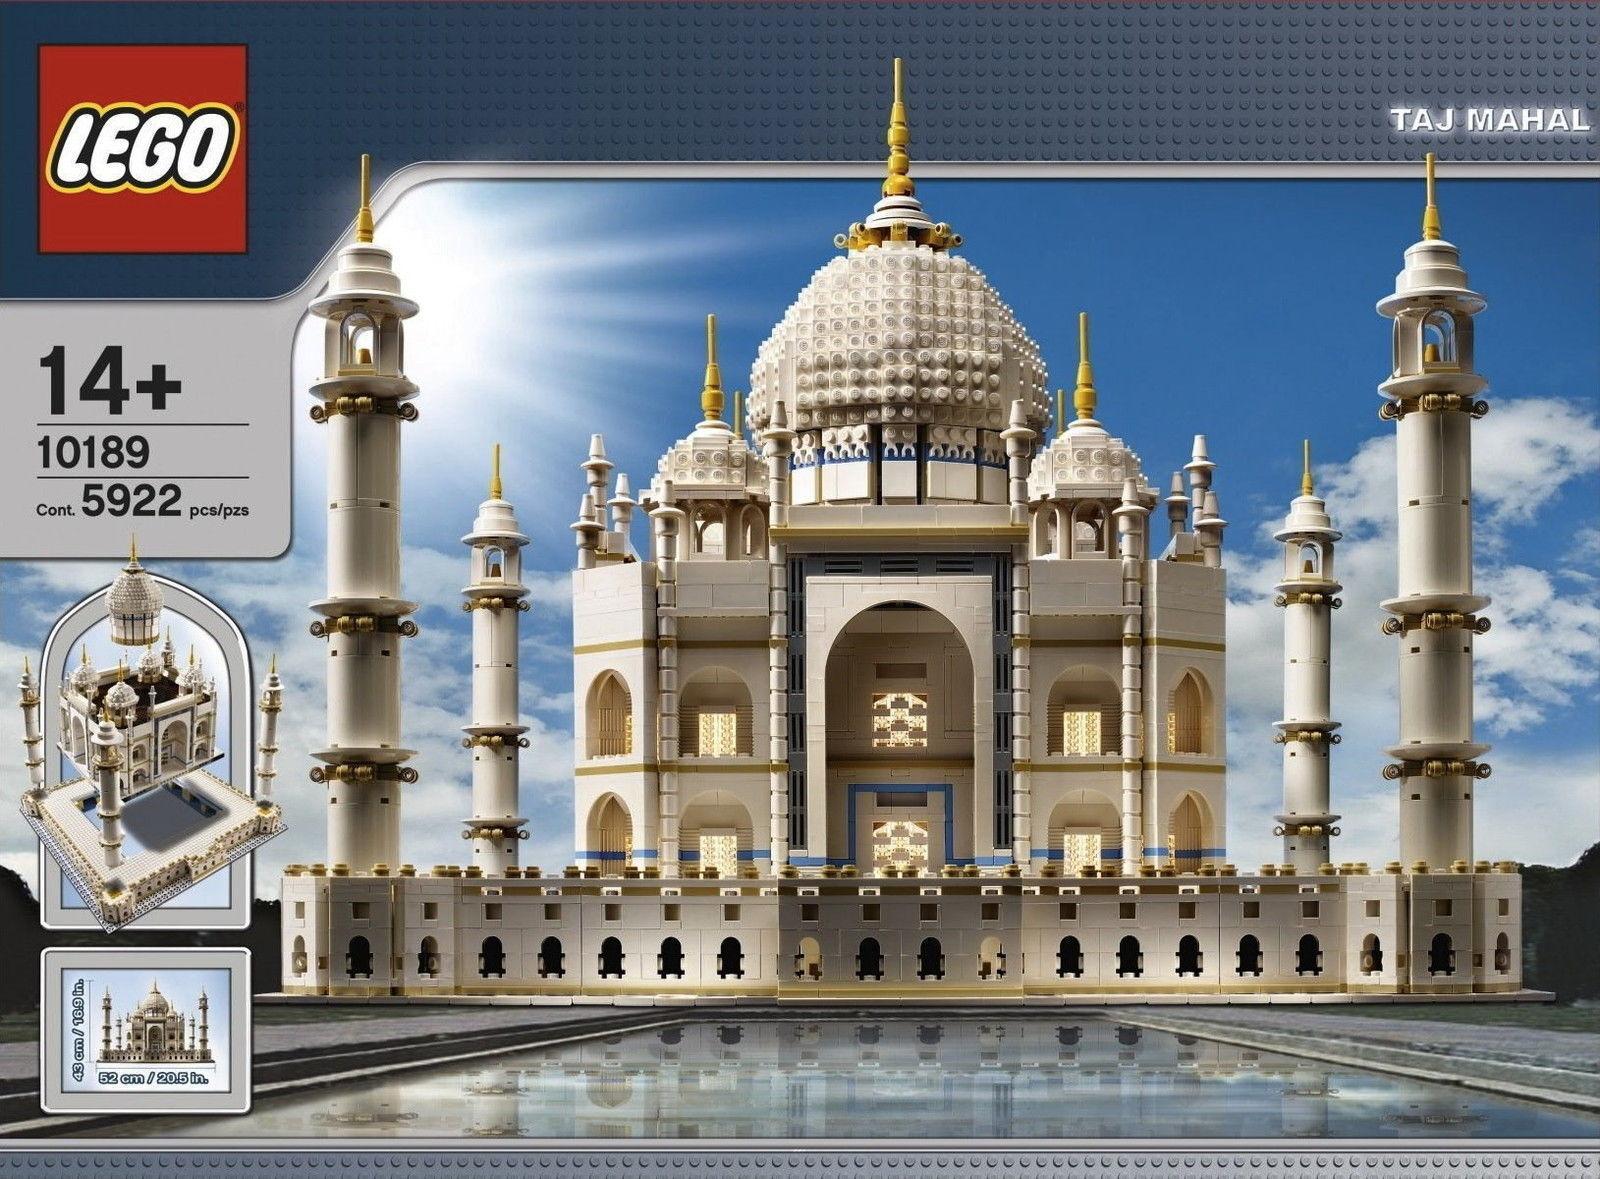 Top 5 LEGO Sets | eBay